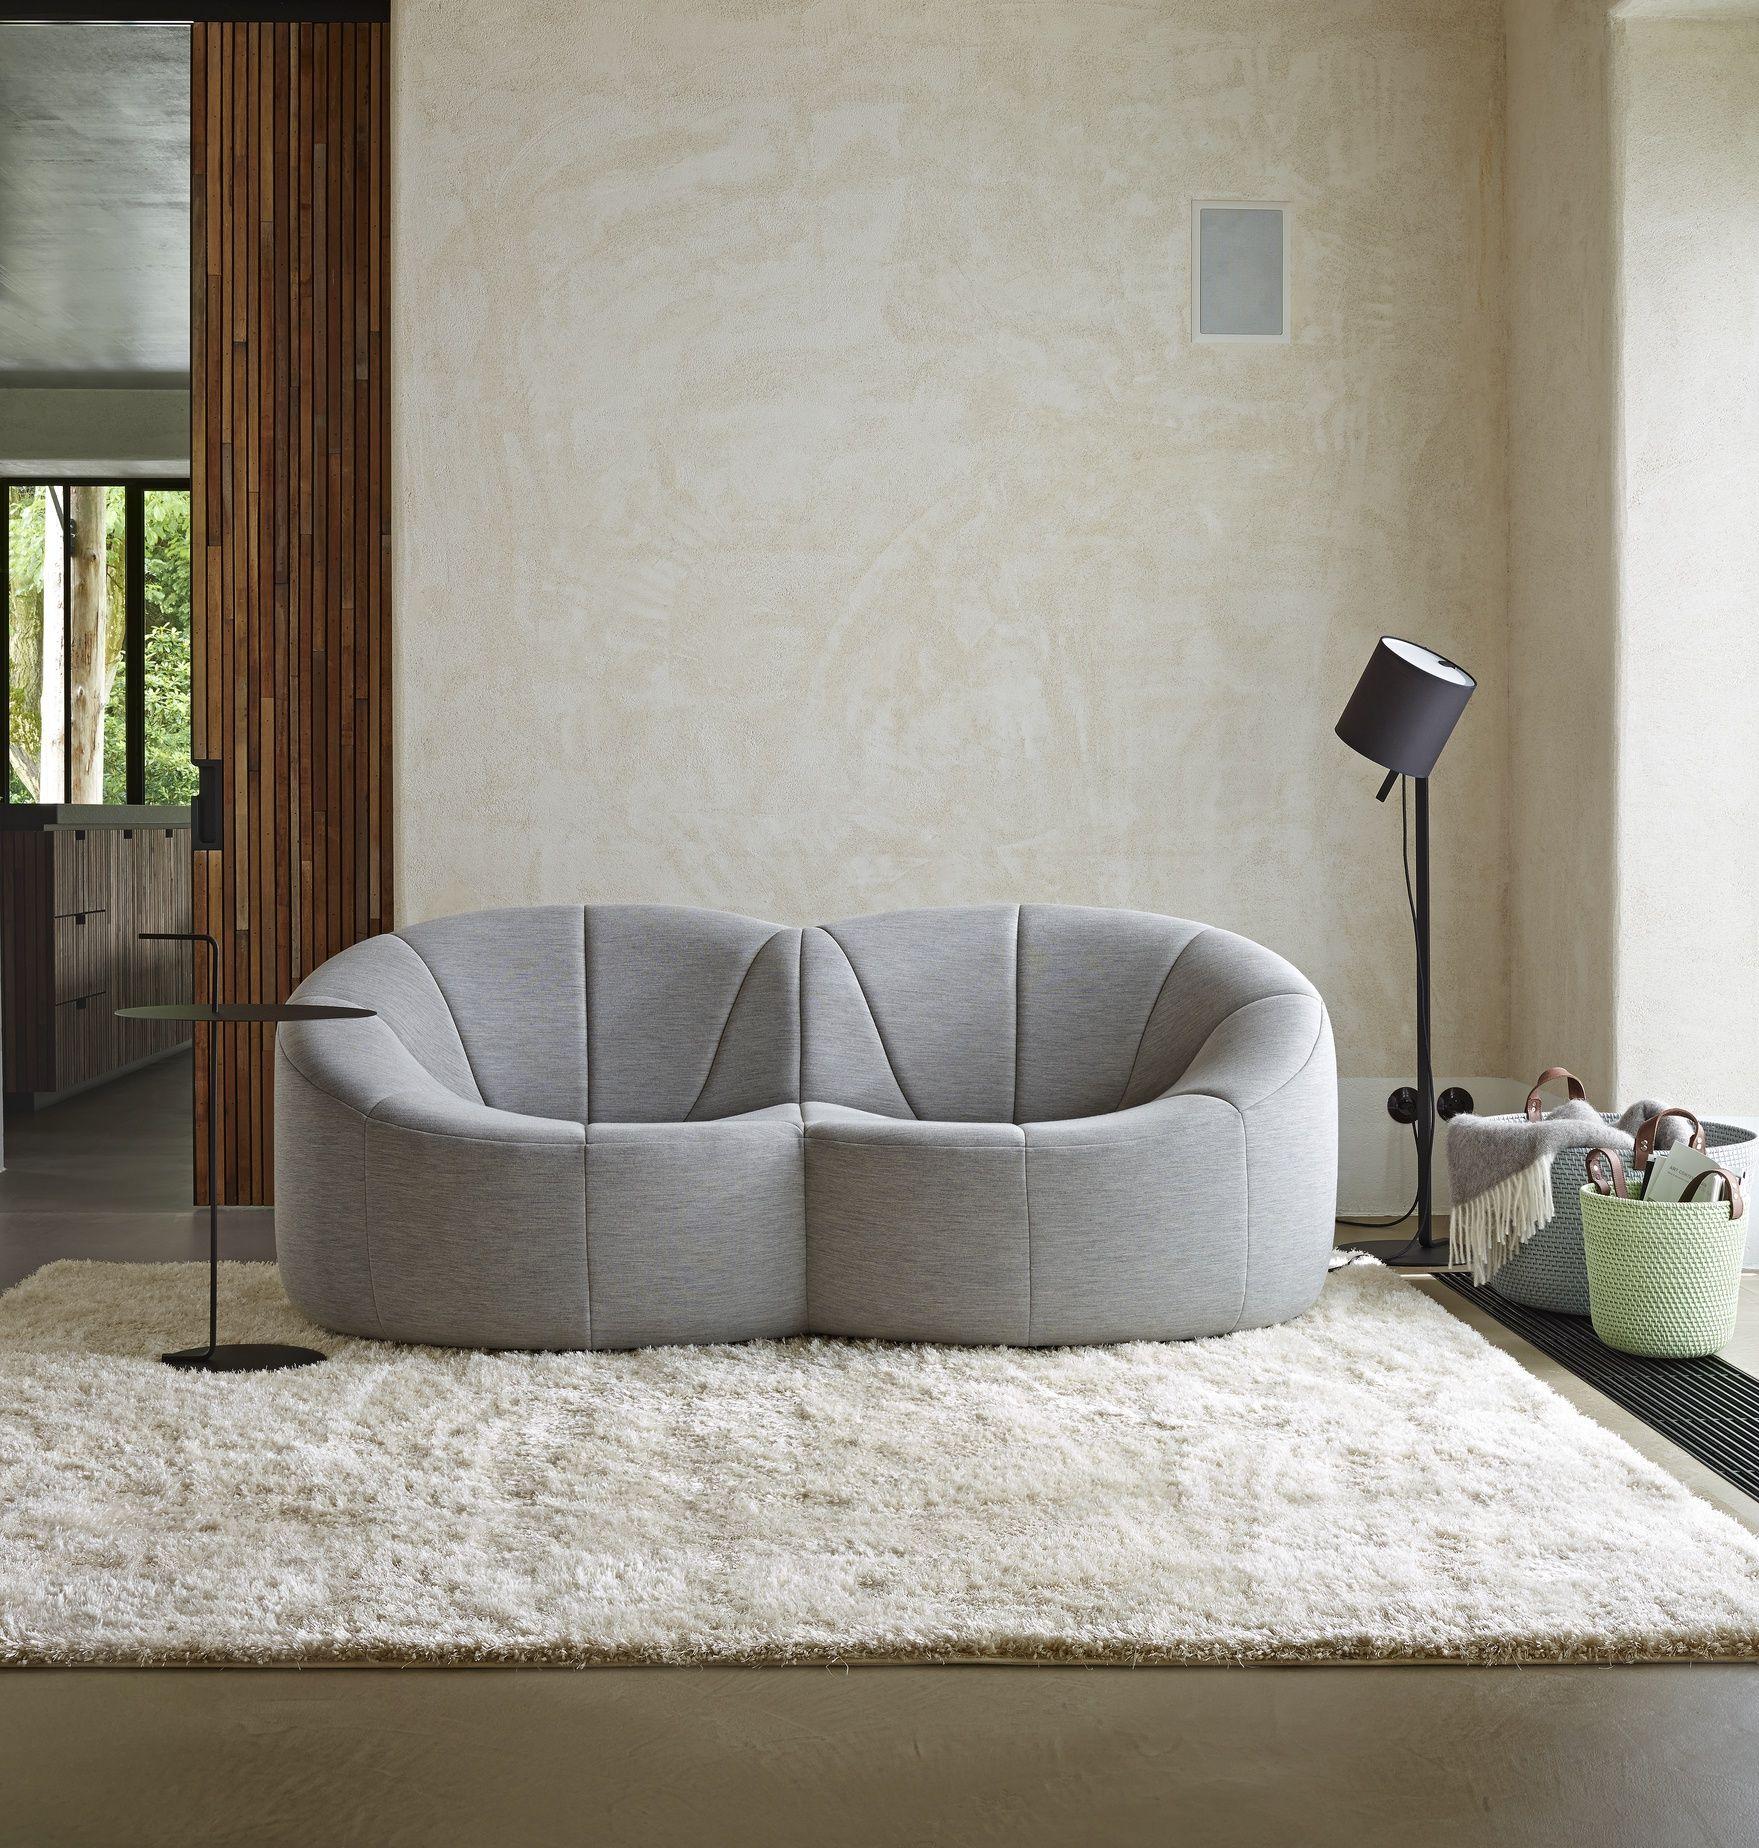 pumpkin, sofas designer : pierre paulin | ligne roset | sofas and